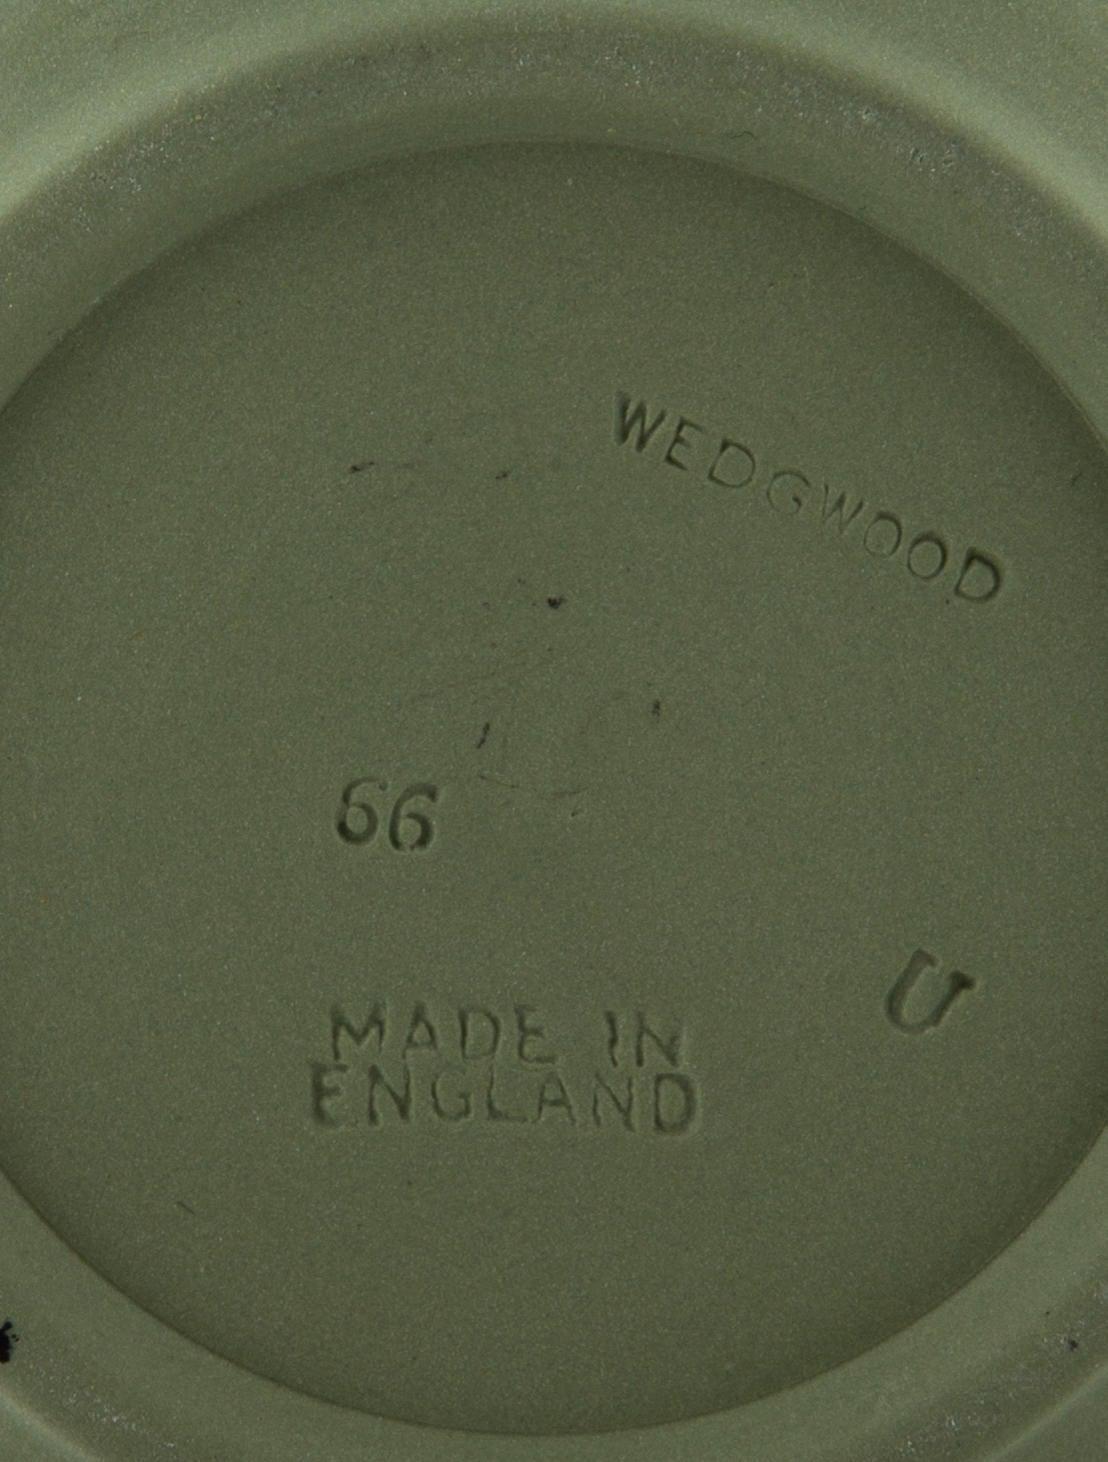 Jasperware Bud Vase Decor And Accessories Wwdgd20473